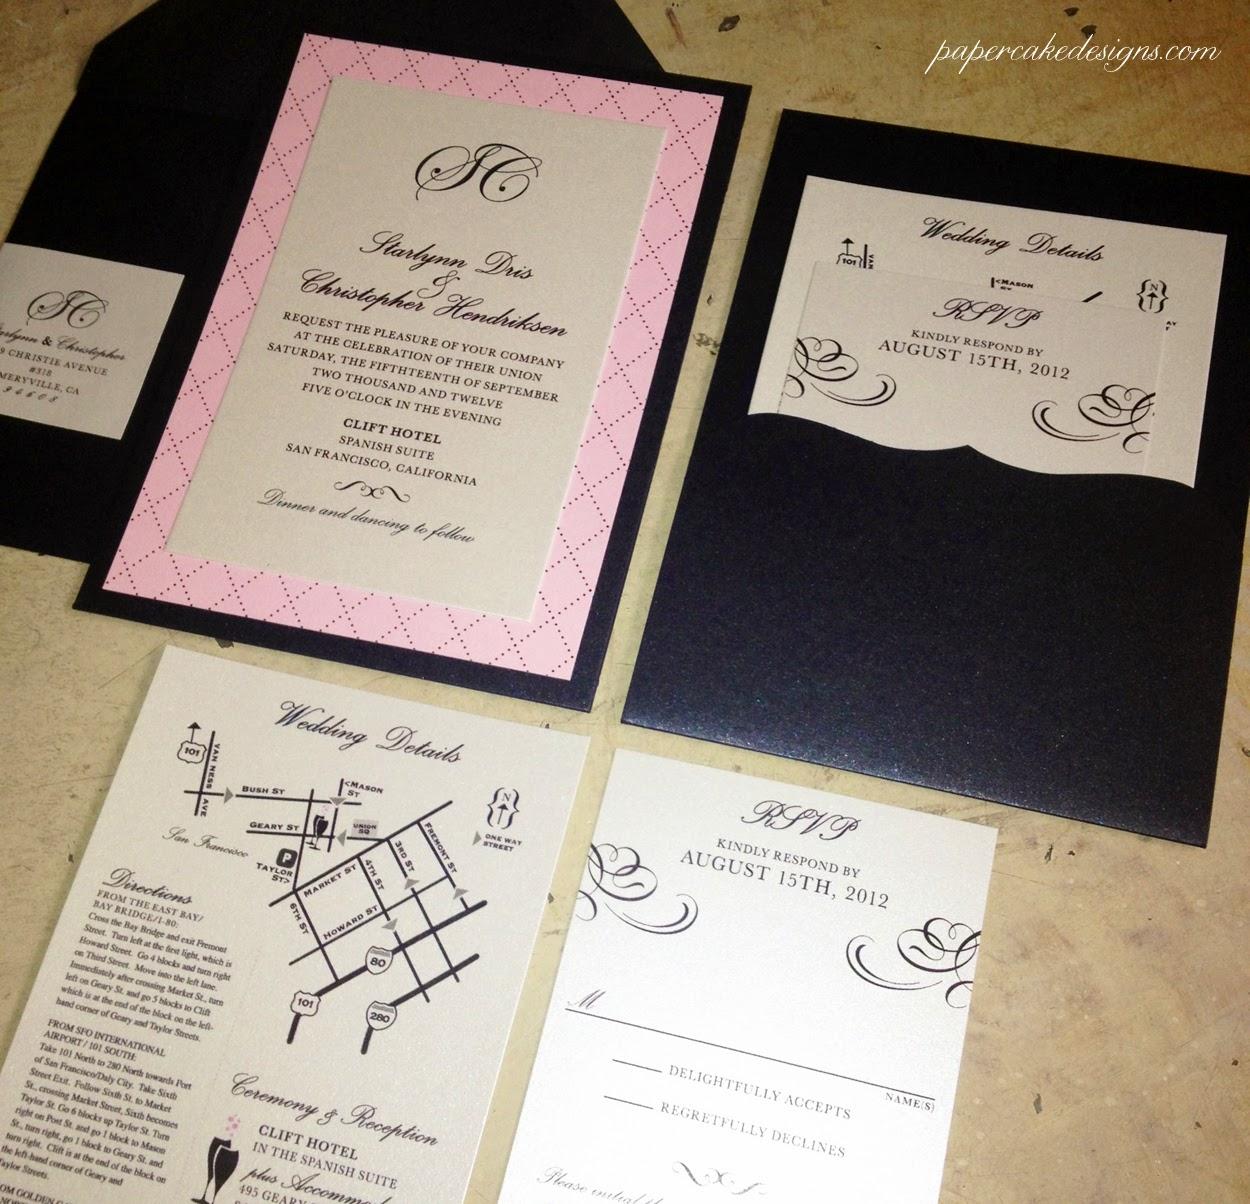 Discount Photo Wedding Invitations: Karl Landry Wedding Invitations Blog: Need Cheap Wedding